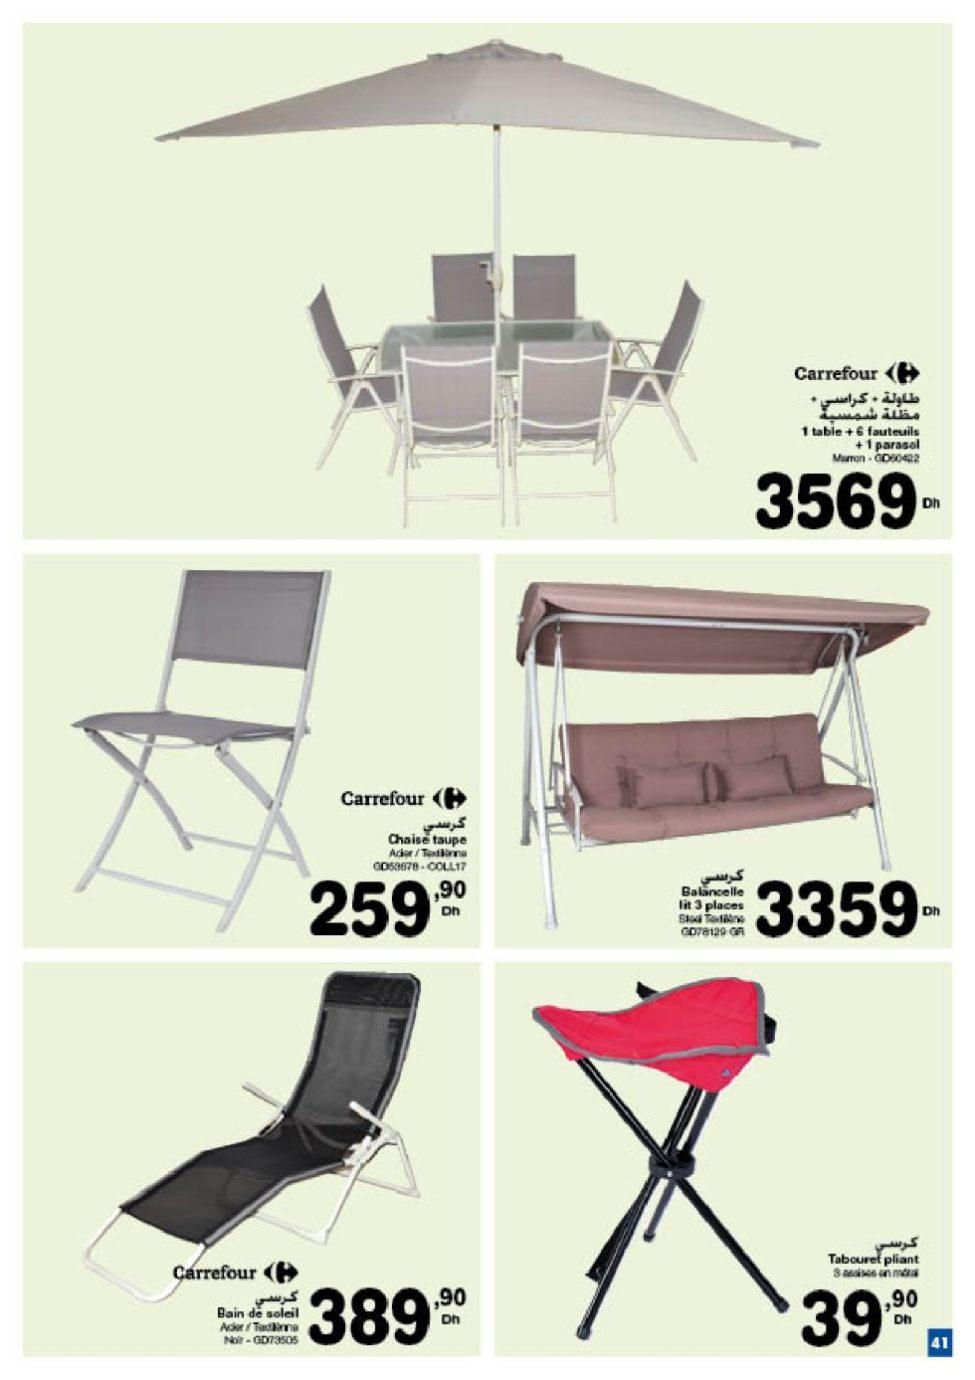 Catalogue Carrefour Maroc عواشر مباركة du 6 Avril au 6 Mai 2069